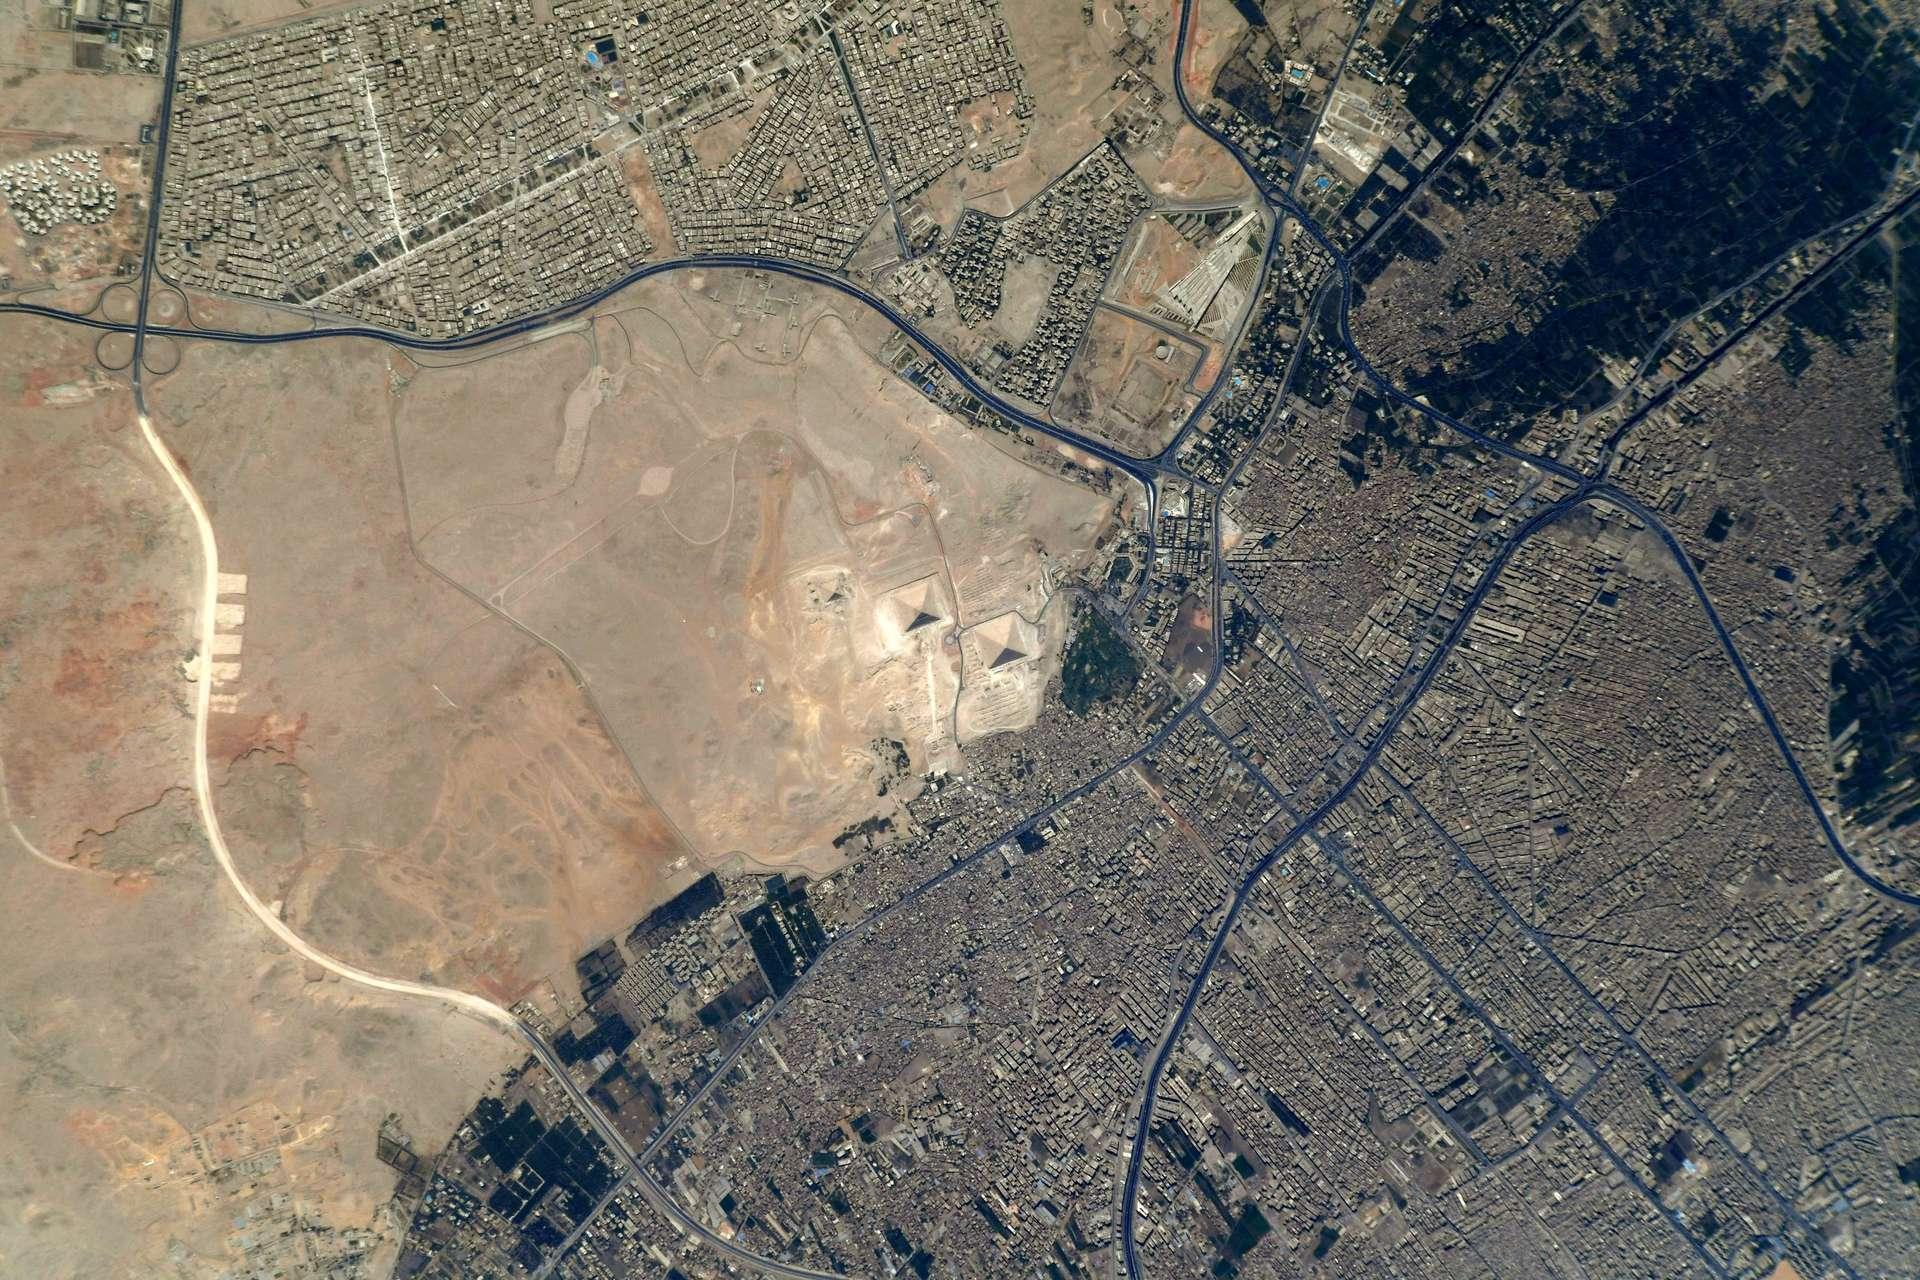 Les pyramides de Gizeh, photographiées par Thomas Pesquet, en mai 2021. © Esa, Nasa, Thomas Pesquet